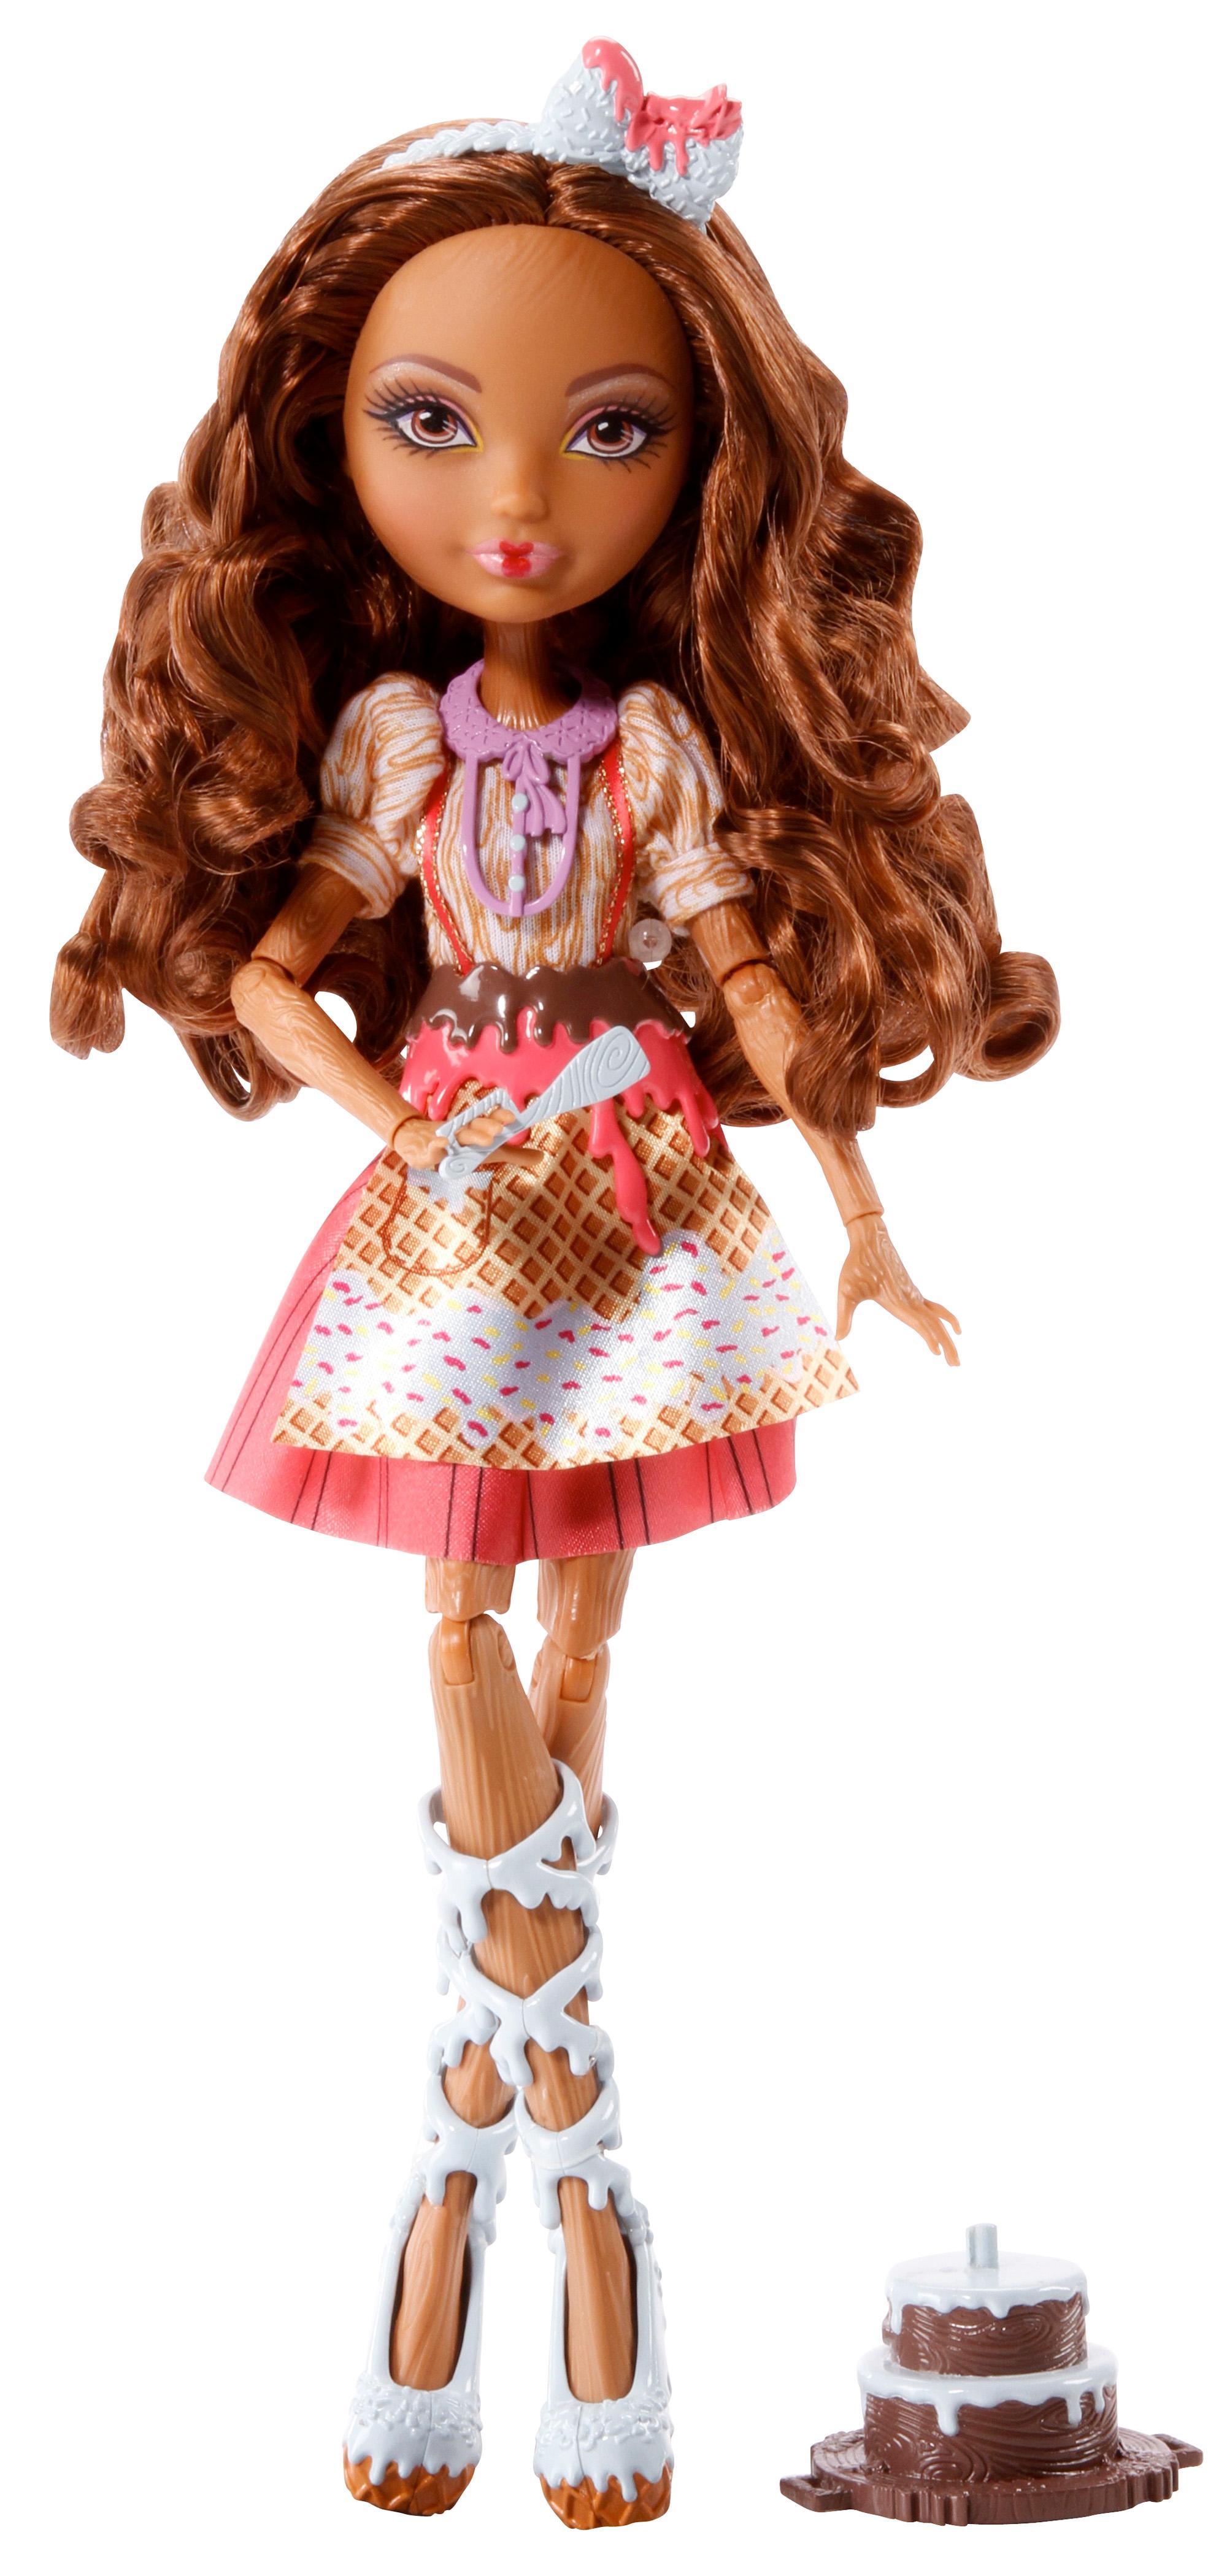 Amazon.com: Ever After High Sugar Coated Cedar Wood Doll ...